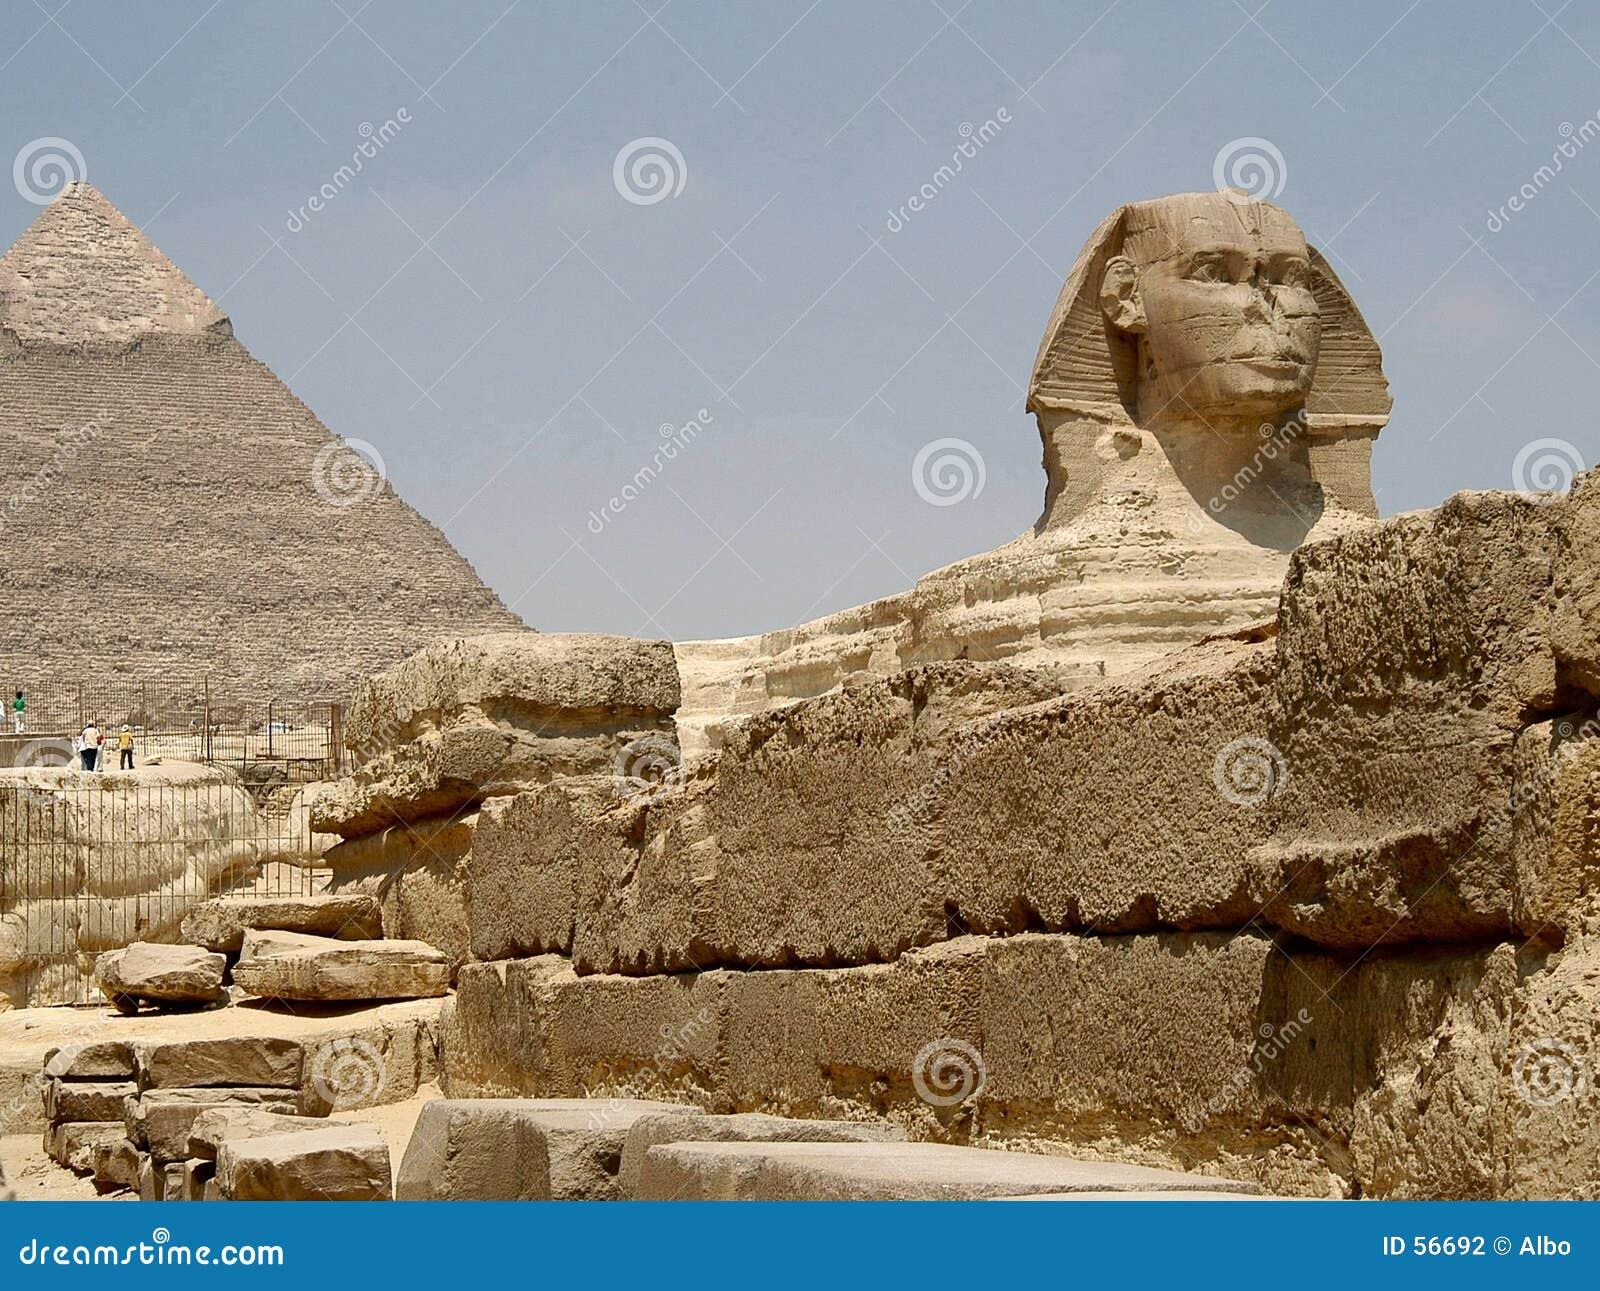 Download πυραμίδα sphynx στοκ εικόνες. εικόνα από βασιλιάς, πυραμίδα - 56692